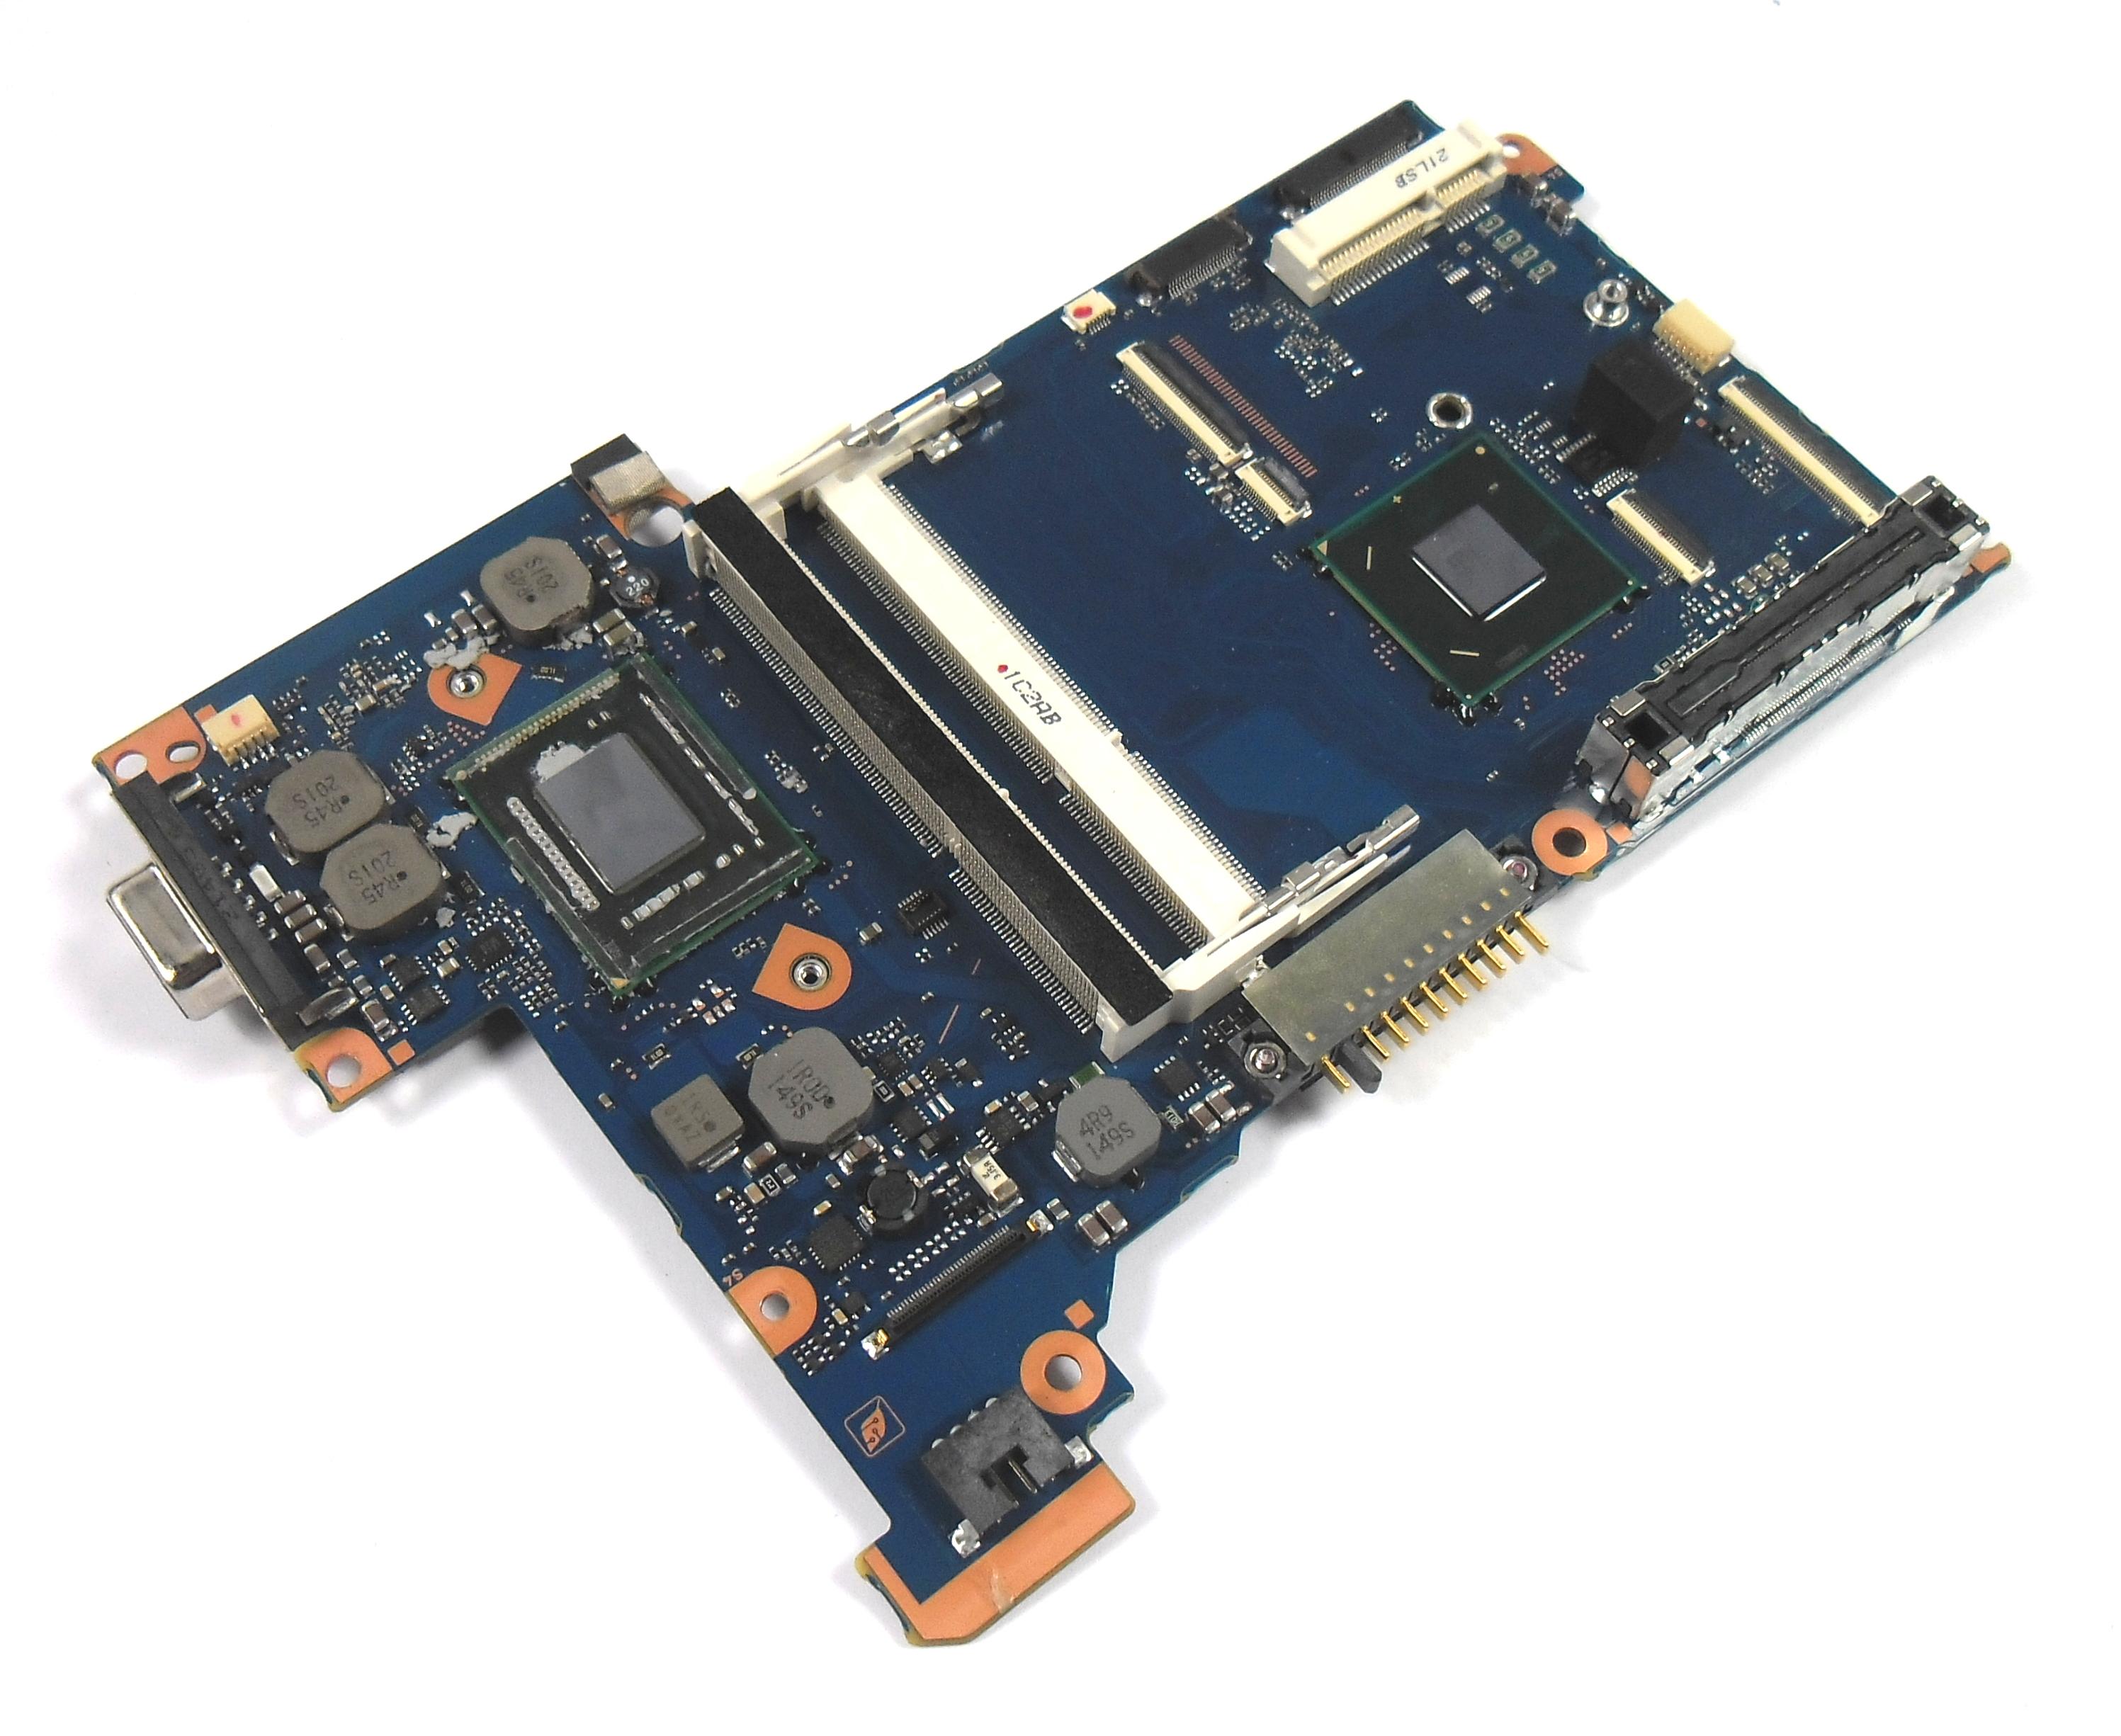 Toshiba FAL3SY3 Portege R830 Laptop Motherboard - Intel i5-2435M Processor